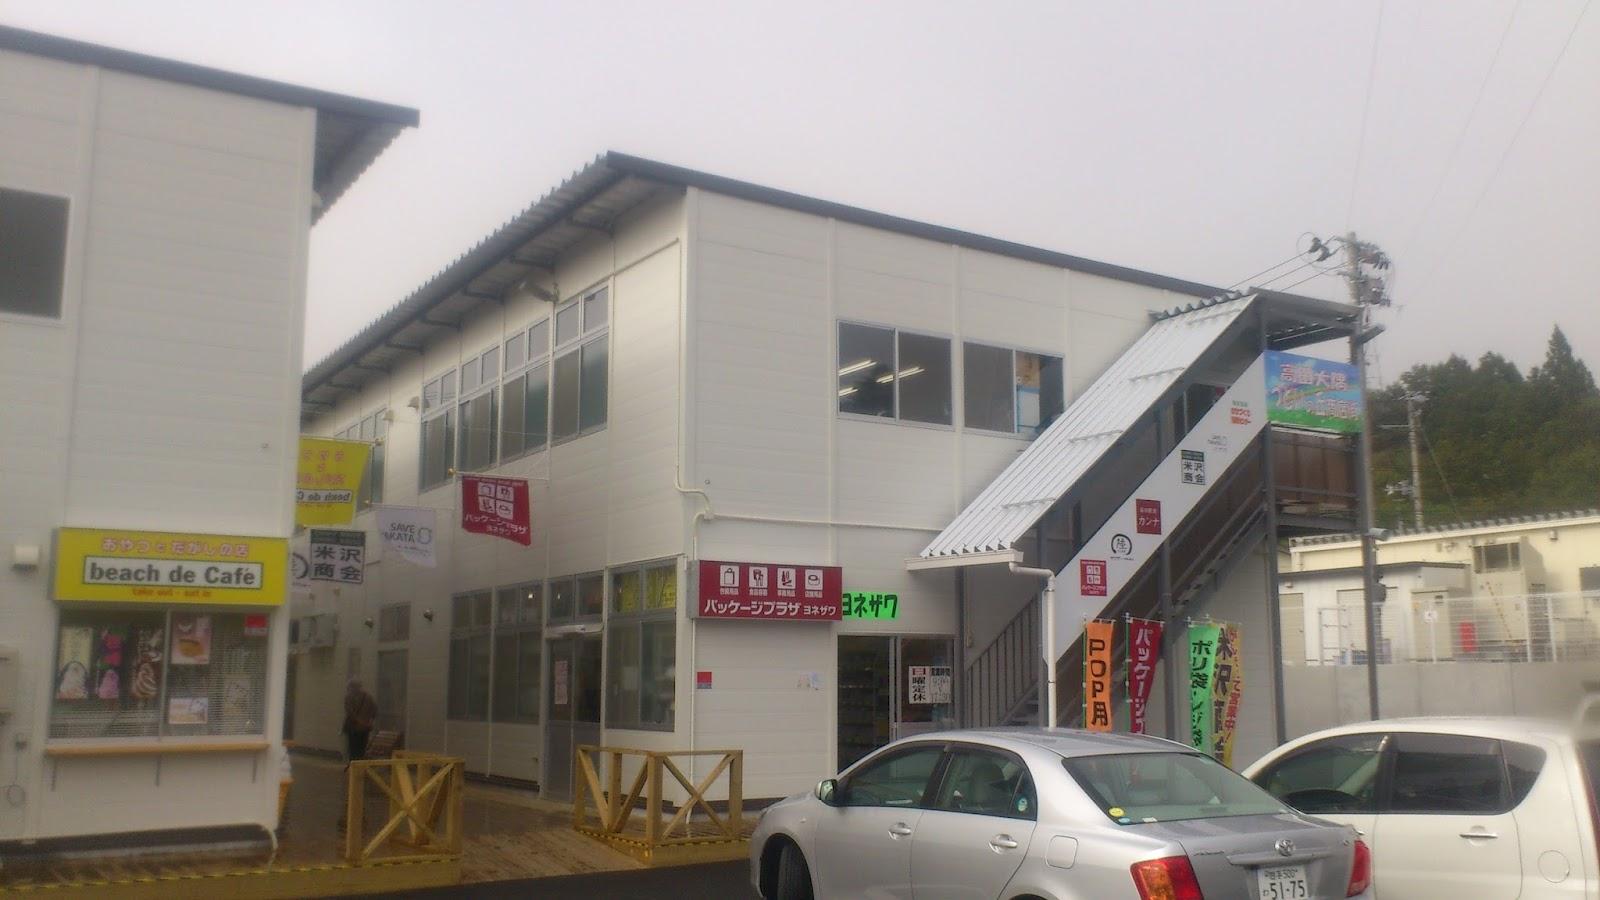 Tip. Blog: 2012年6月4日一ノ関→陸前高田市→気仙沼市訪問